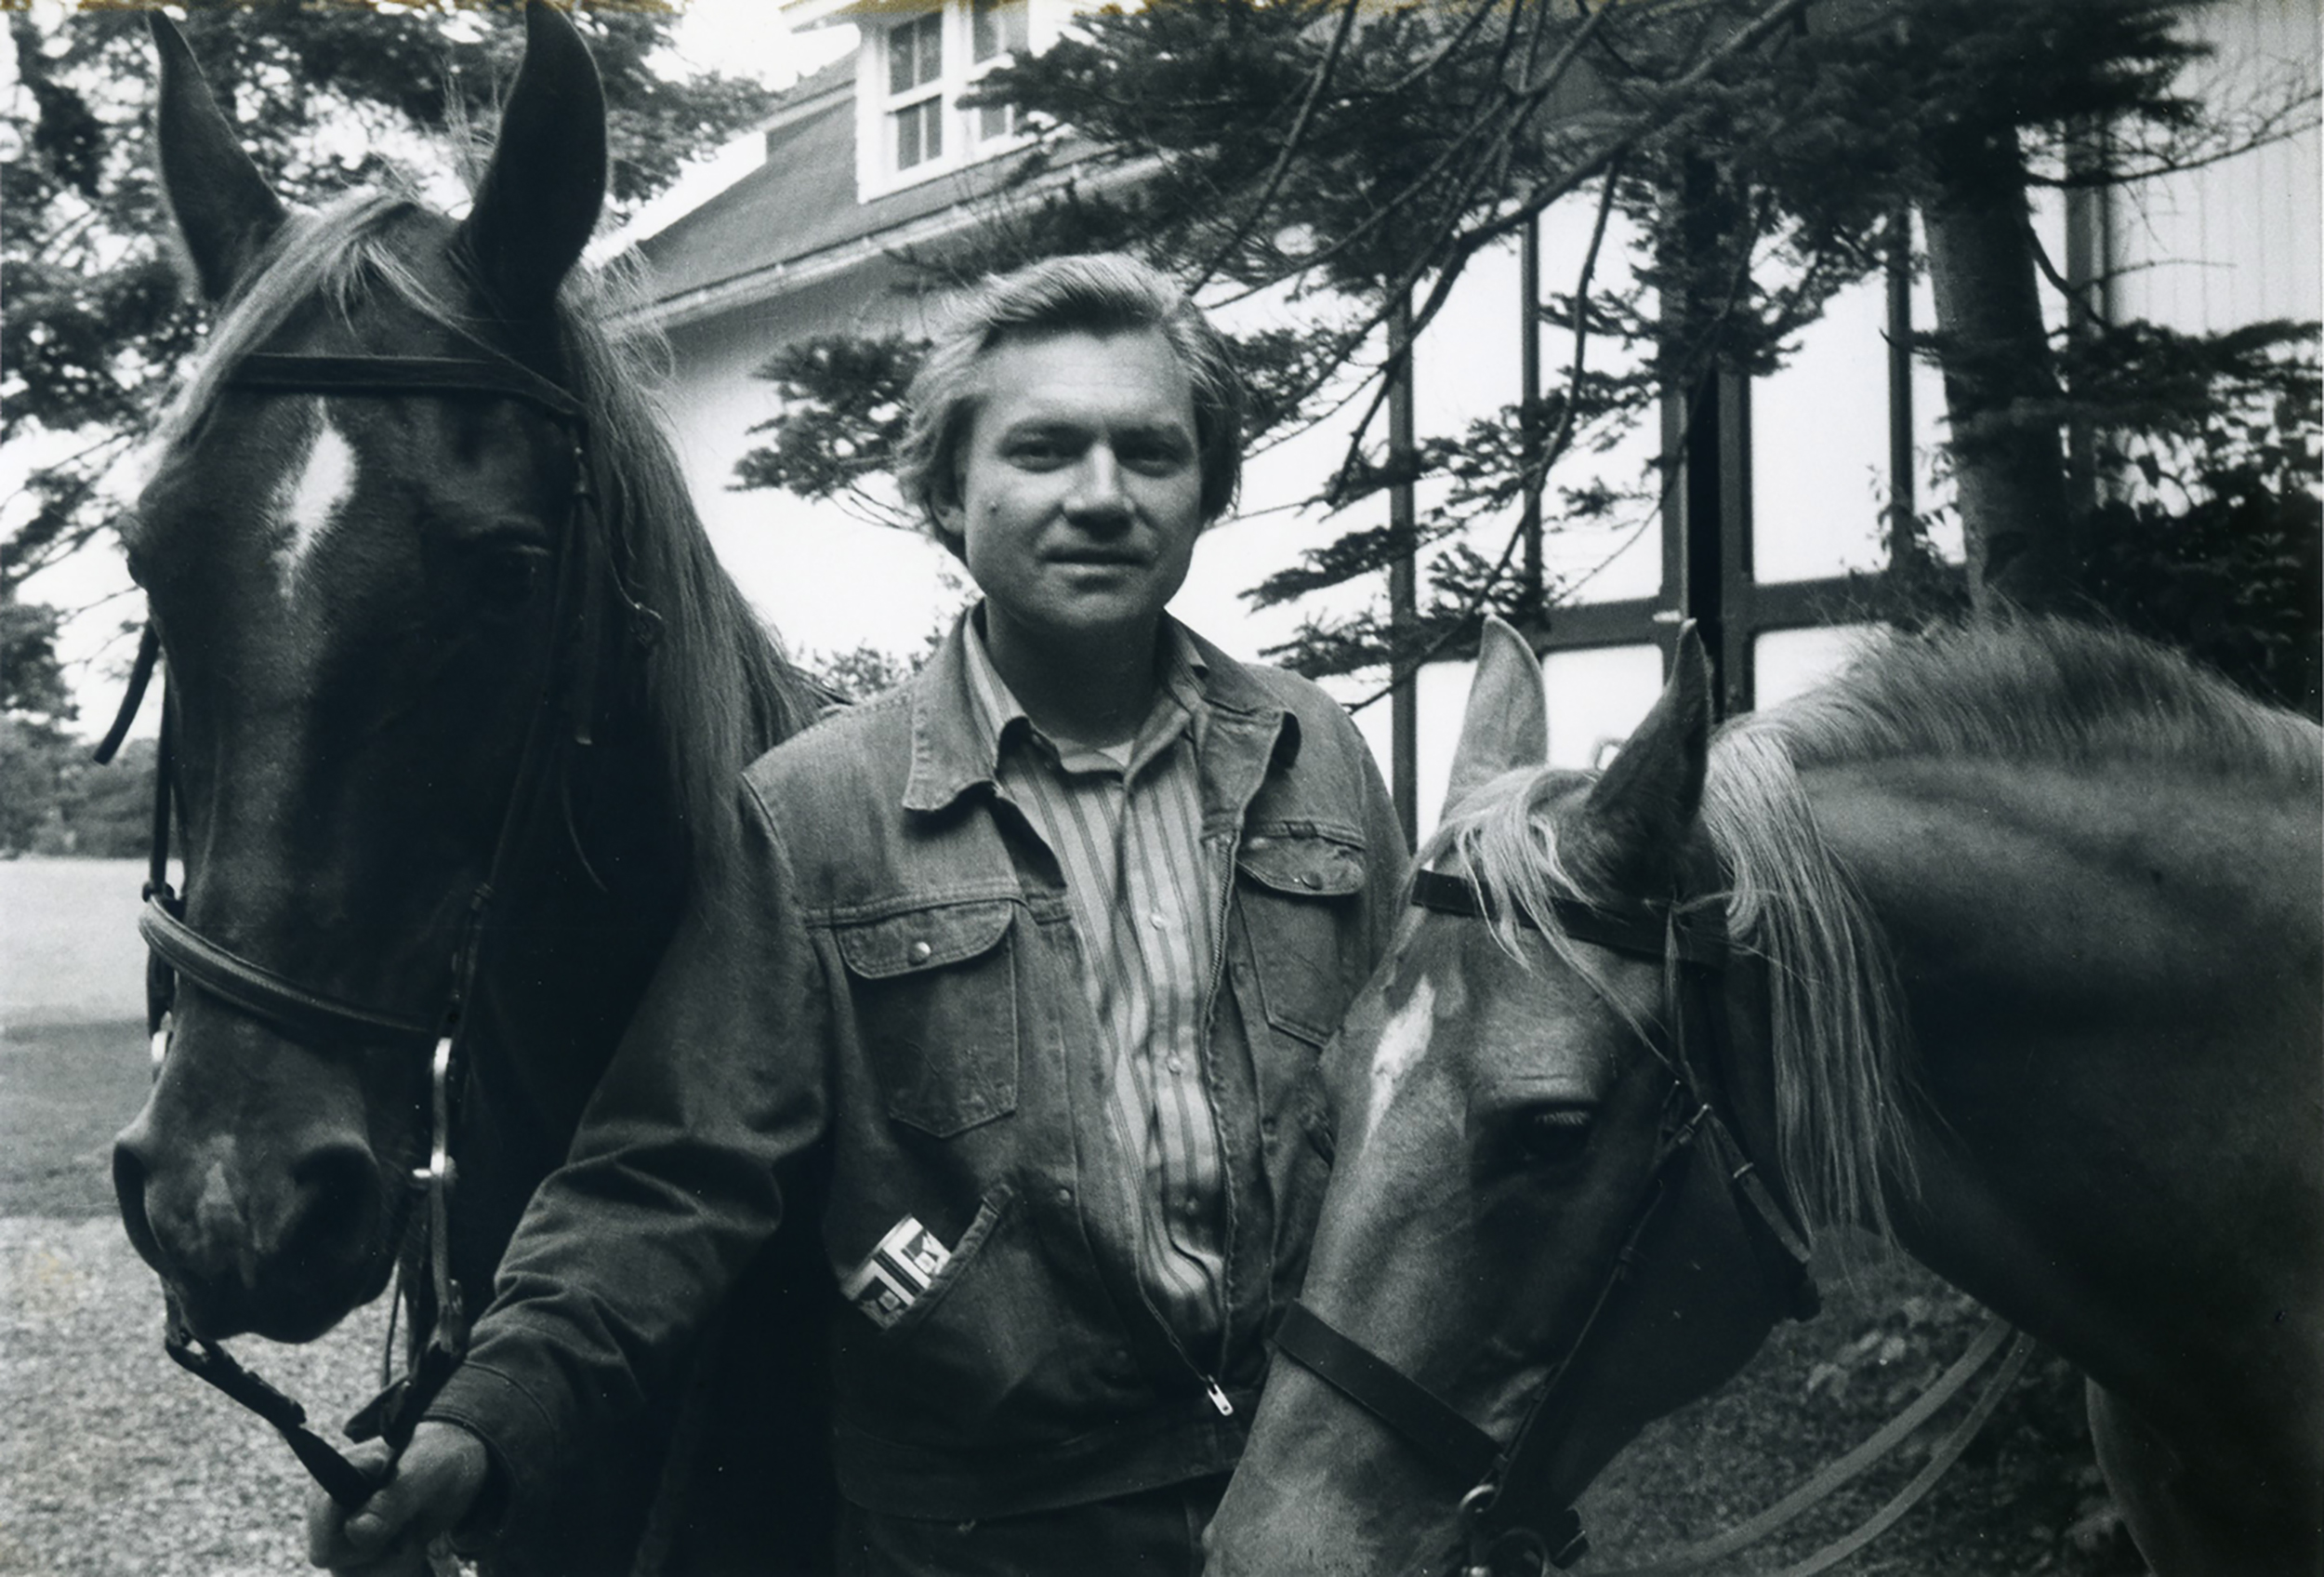 "JU with horses ""Before the ride""at the family farm, Chardon, Ohio. Summer."